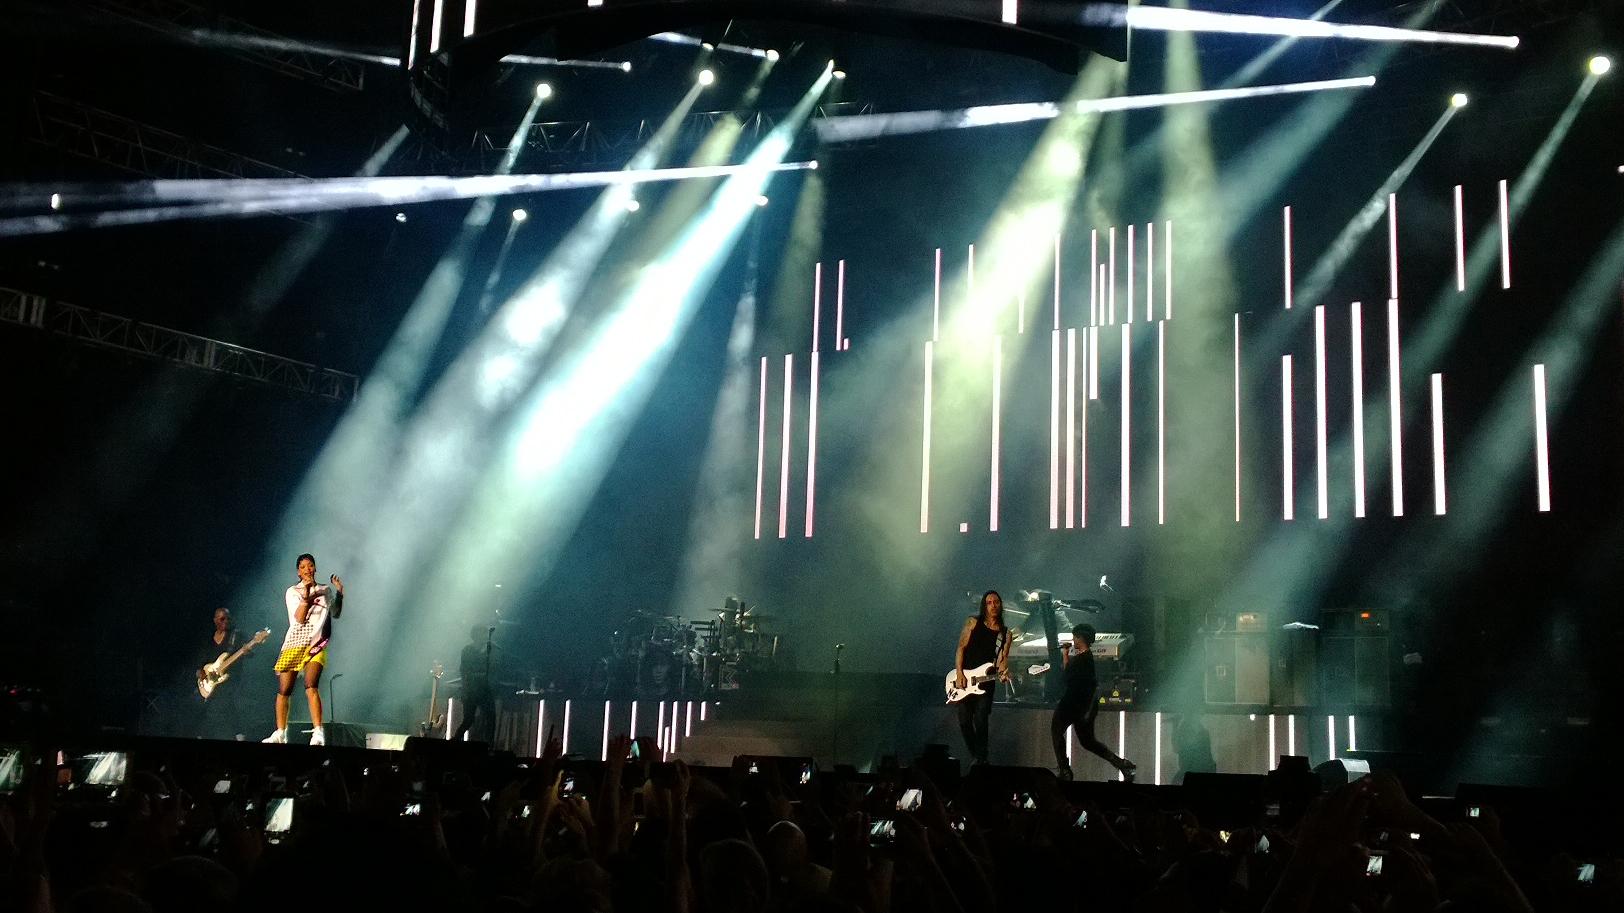 Nokia-Lumia-1020-Rihanna-concert-2